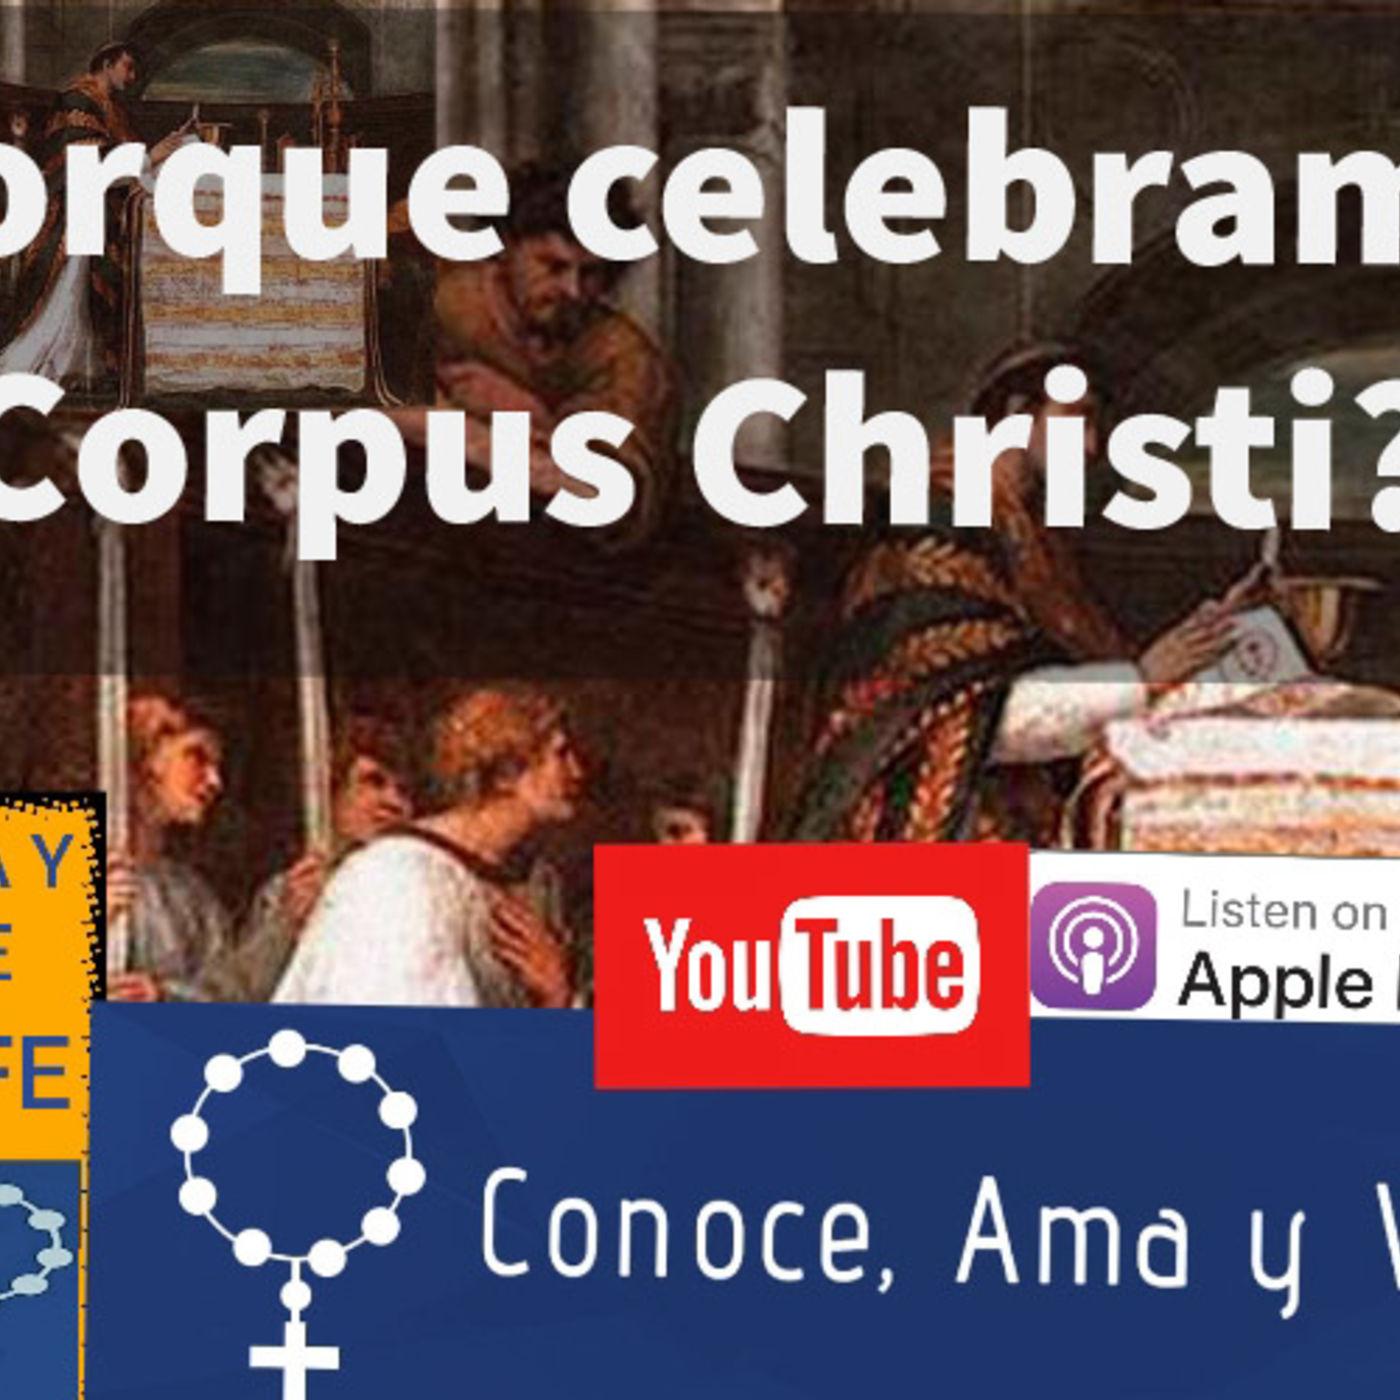 Episodio 53: ¿Porque celebramos Corpus Christi?